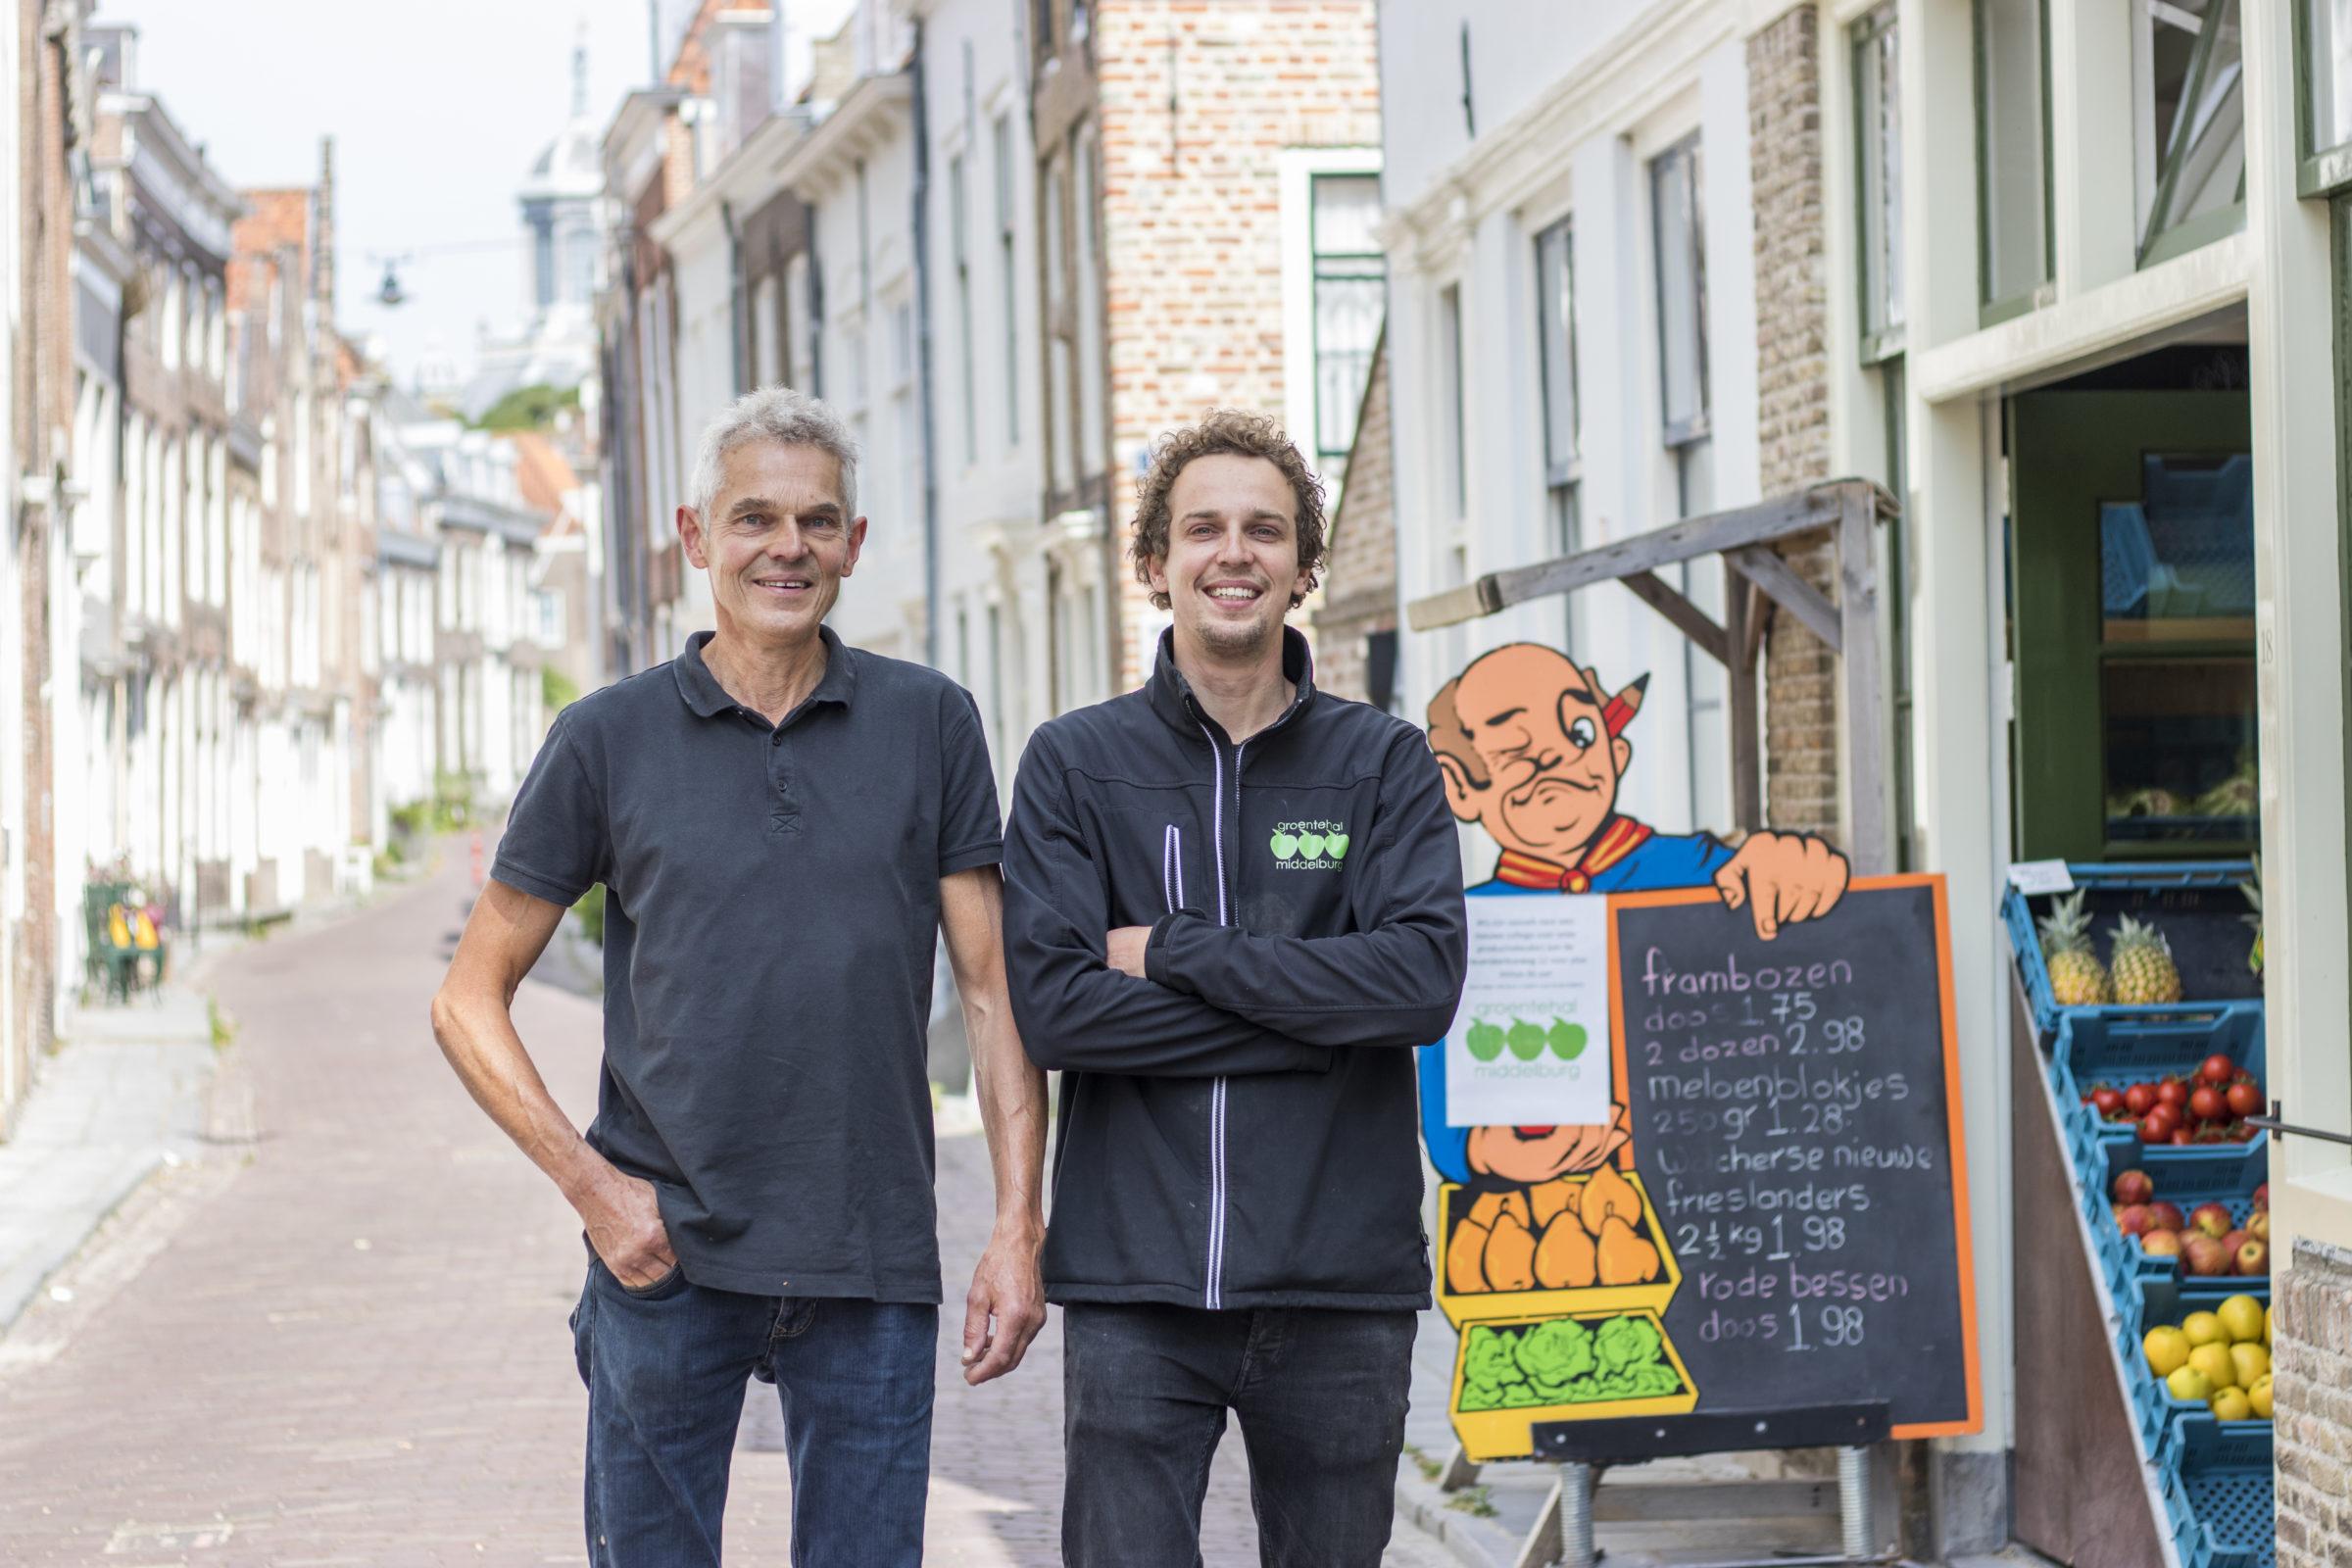 Personeel Groentehal Middelburg Applicatie